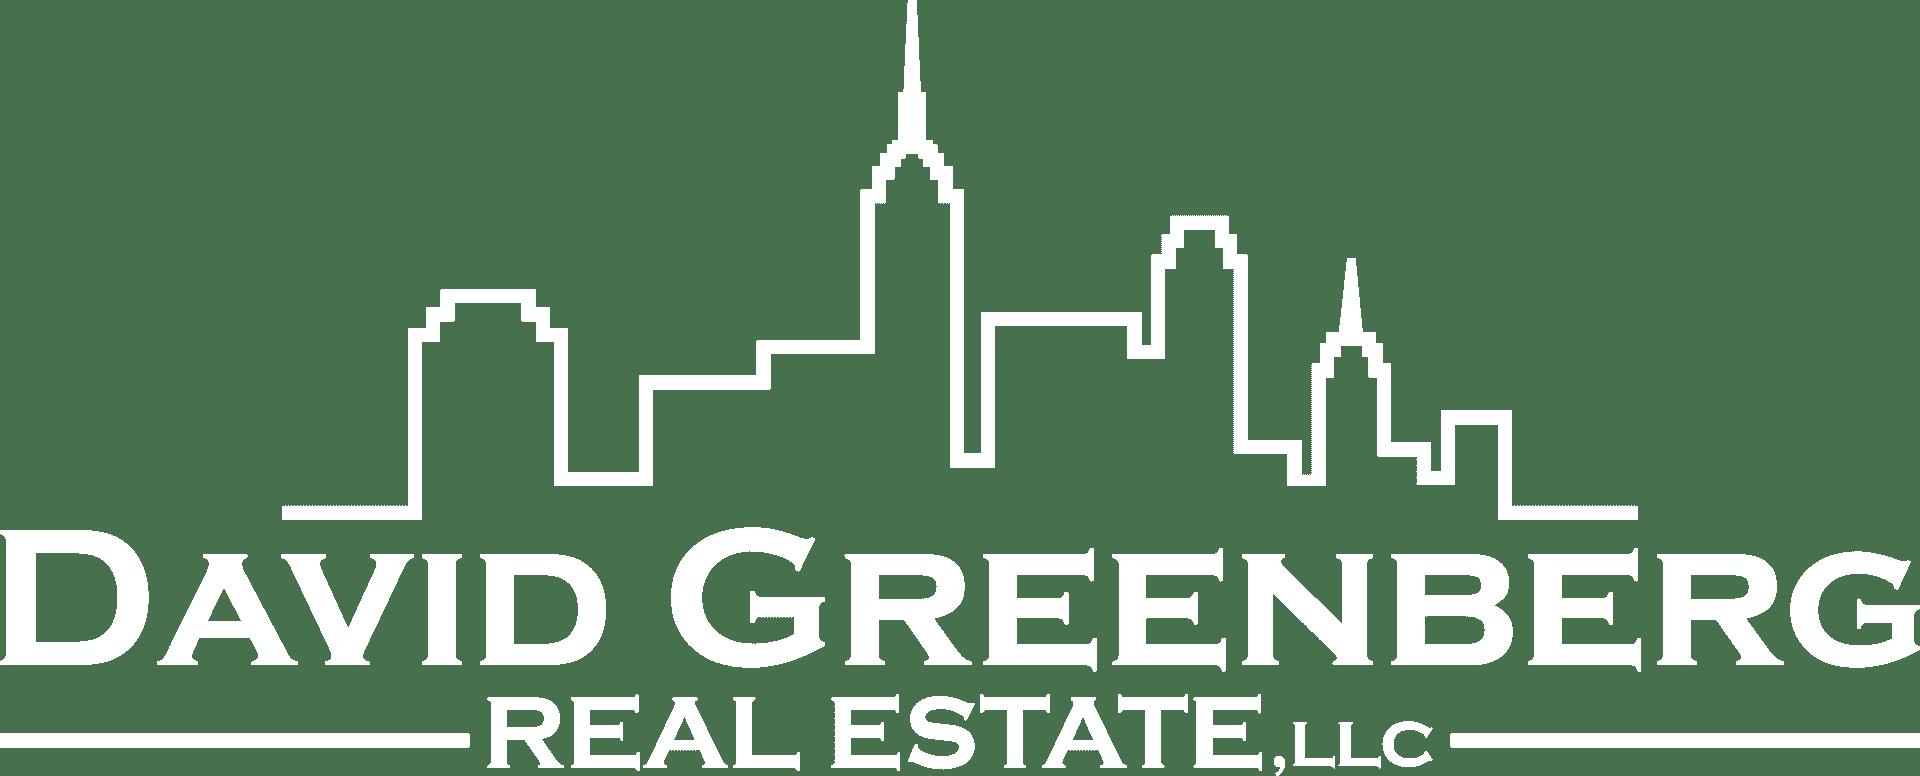 David-Greenberg-White-Logo